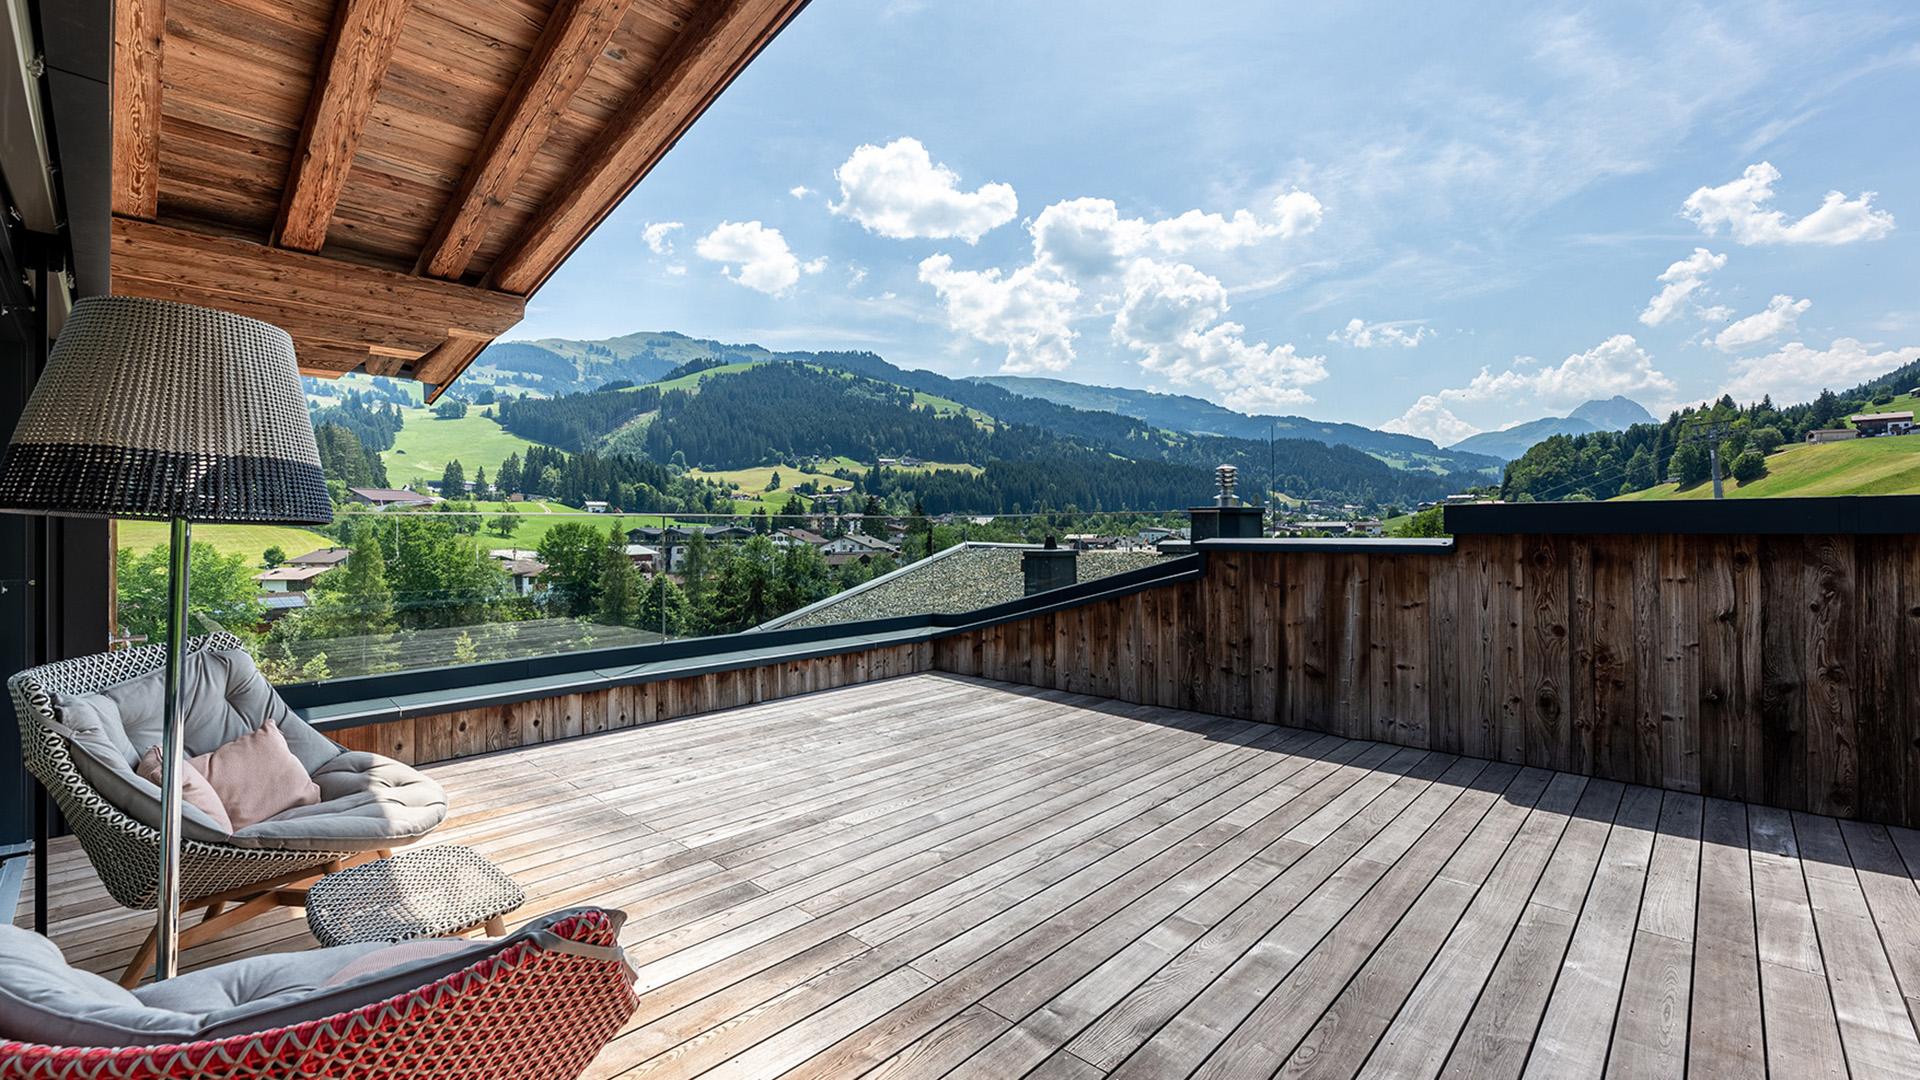 The Kirchberg Chalets Chalet, Austria